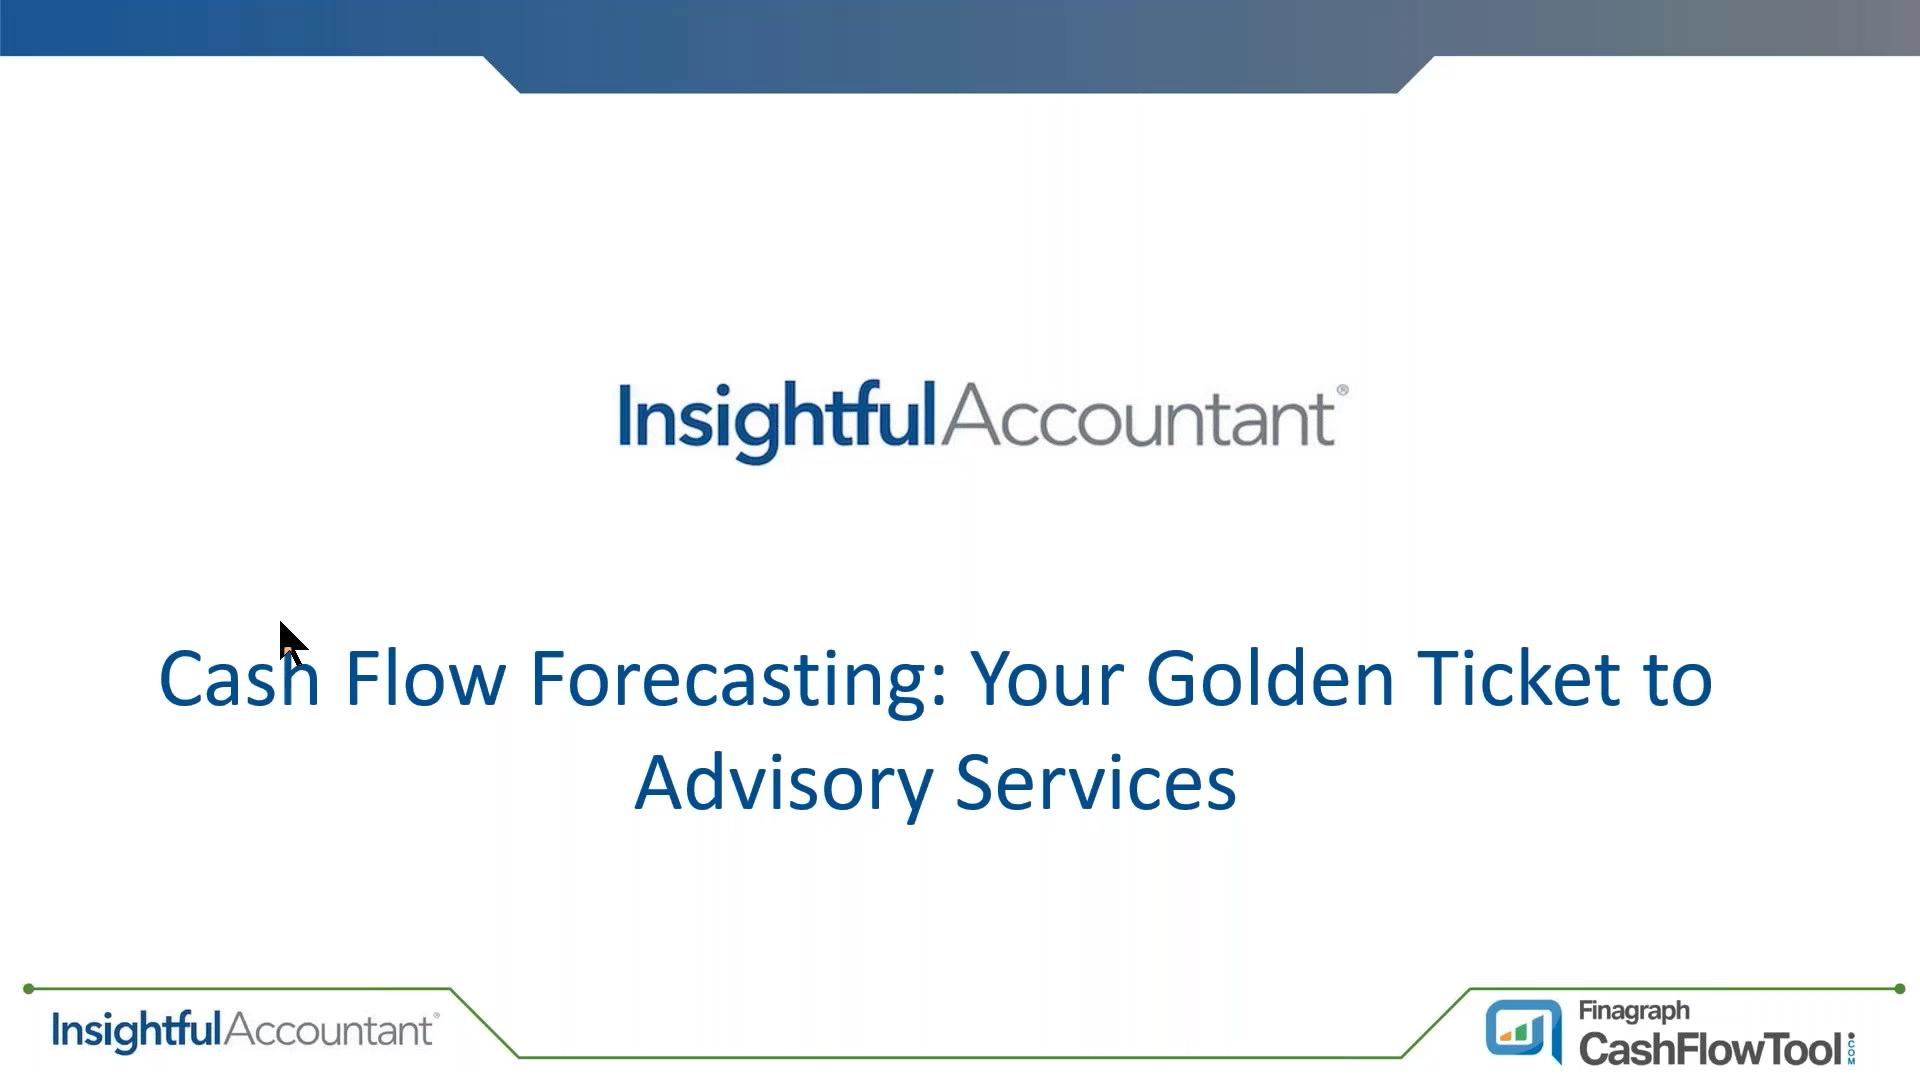 Insightful Accountant - Golden Ticket Webinar - 08-21-19 (Justin Pulgrano)